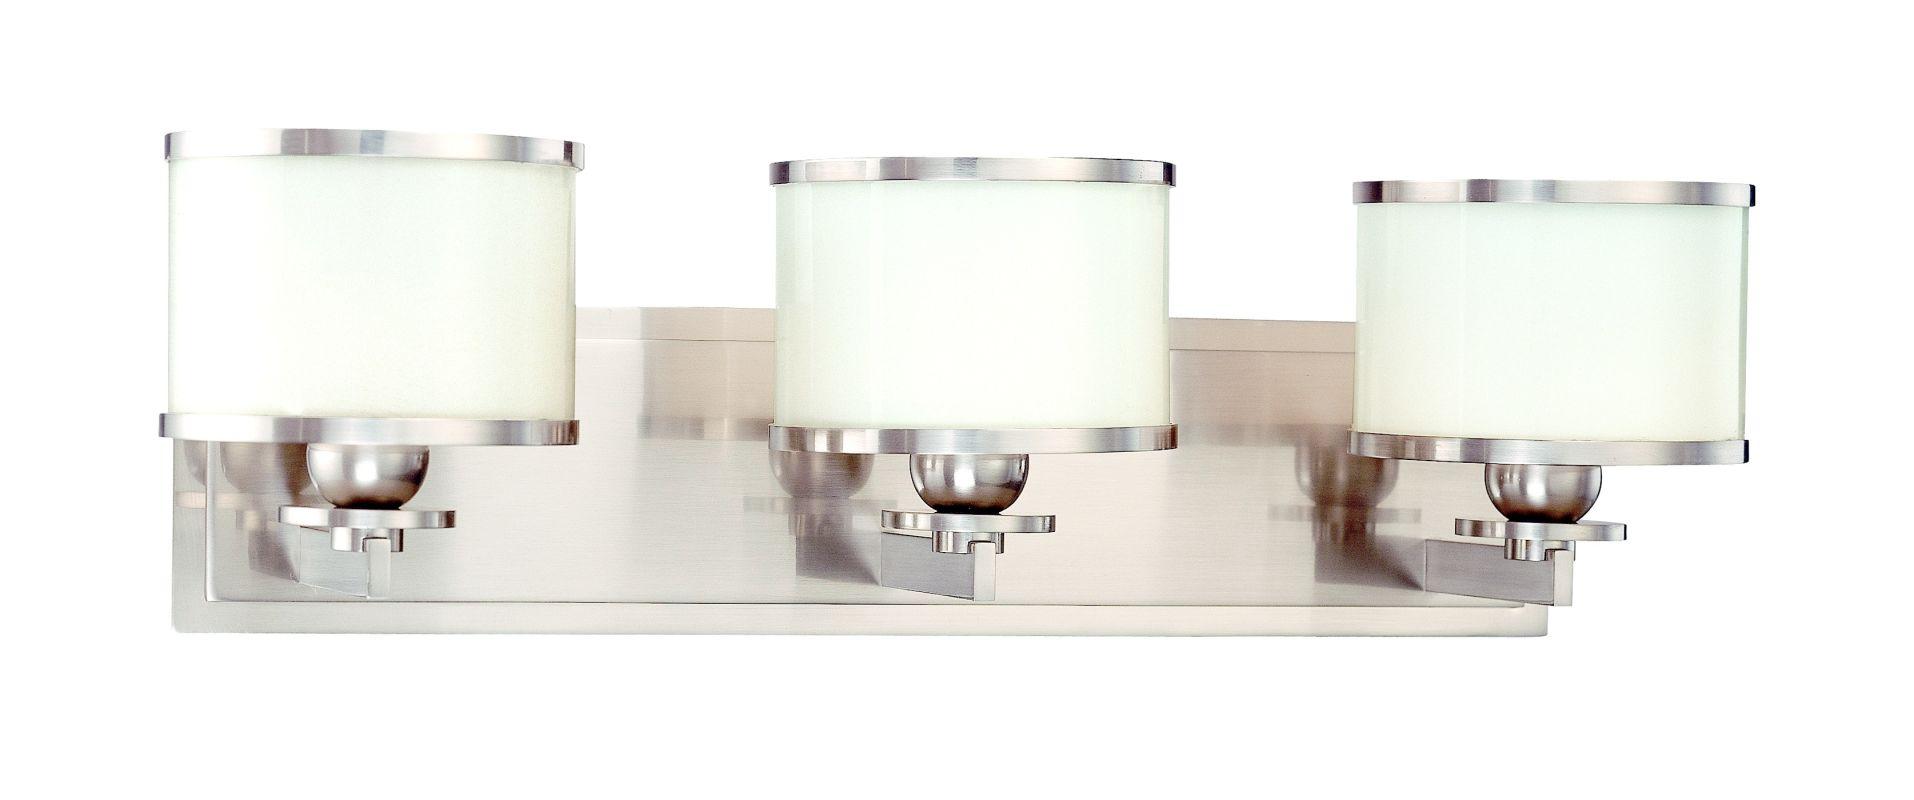 Hudson Valley Lighting 6103 Basking Ridge 3 Light Bathroom Vanity Sale $480.00 ITEM: bci1485697 ID#:6103-SN UPC: 806134106843 :